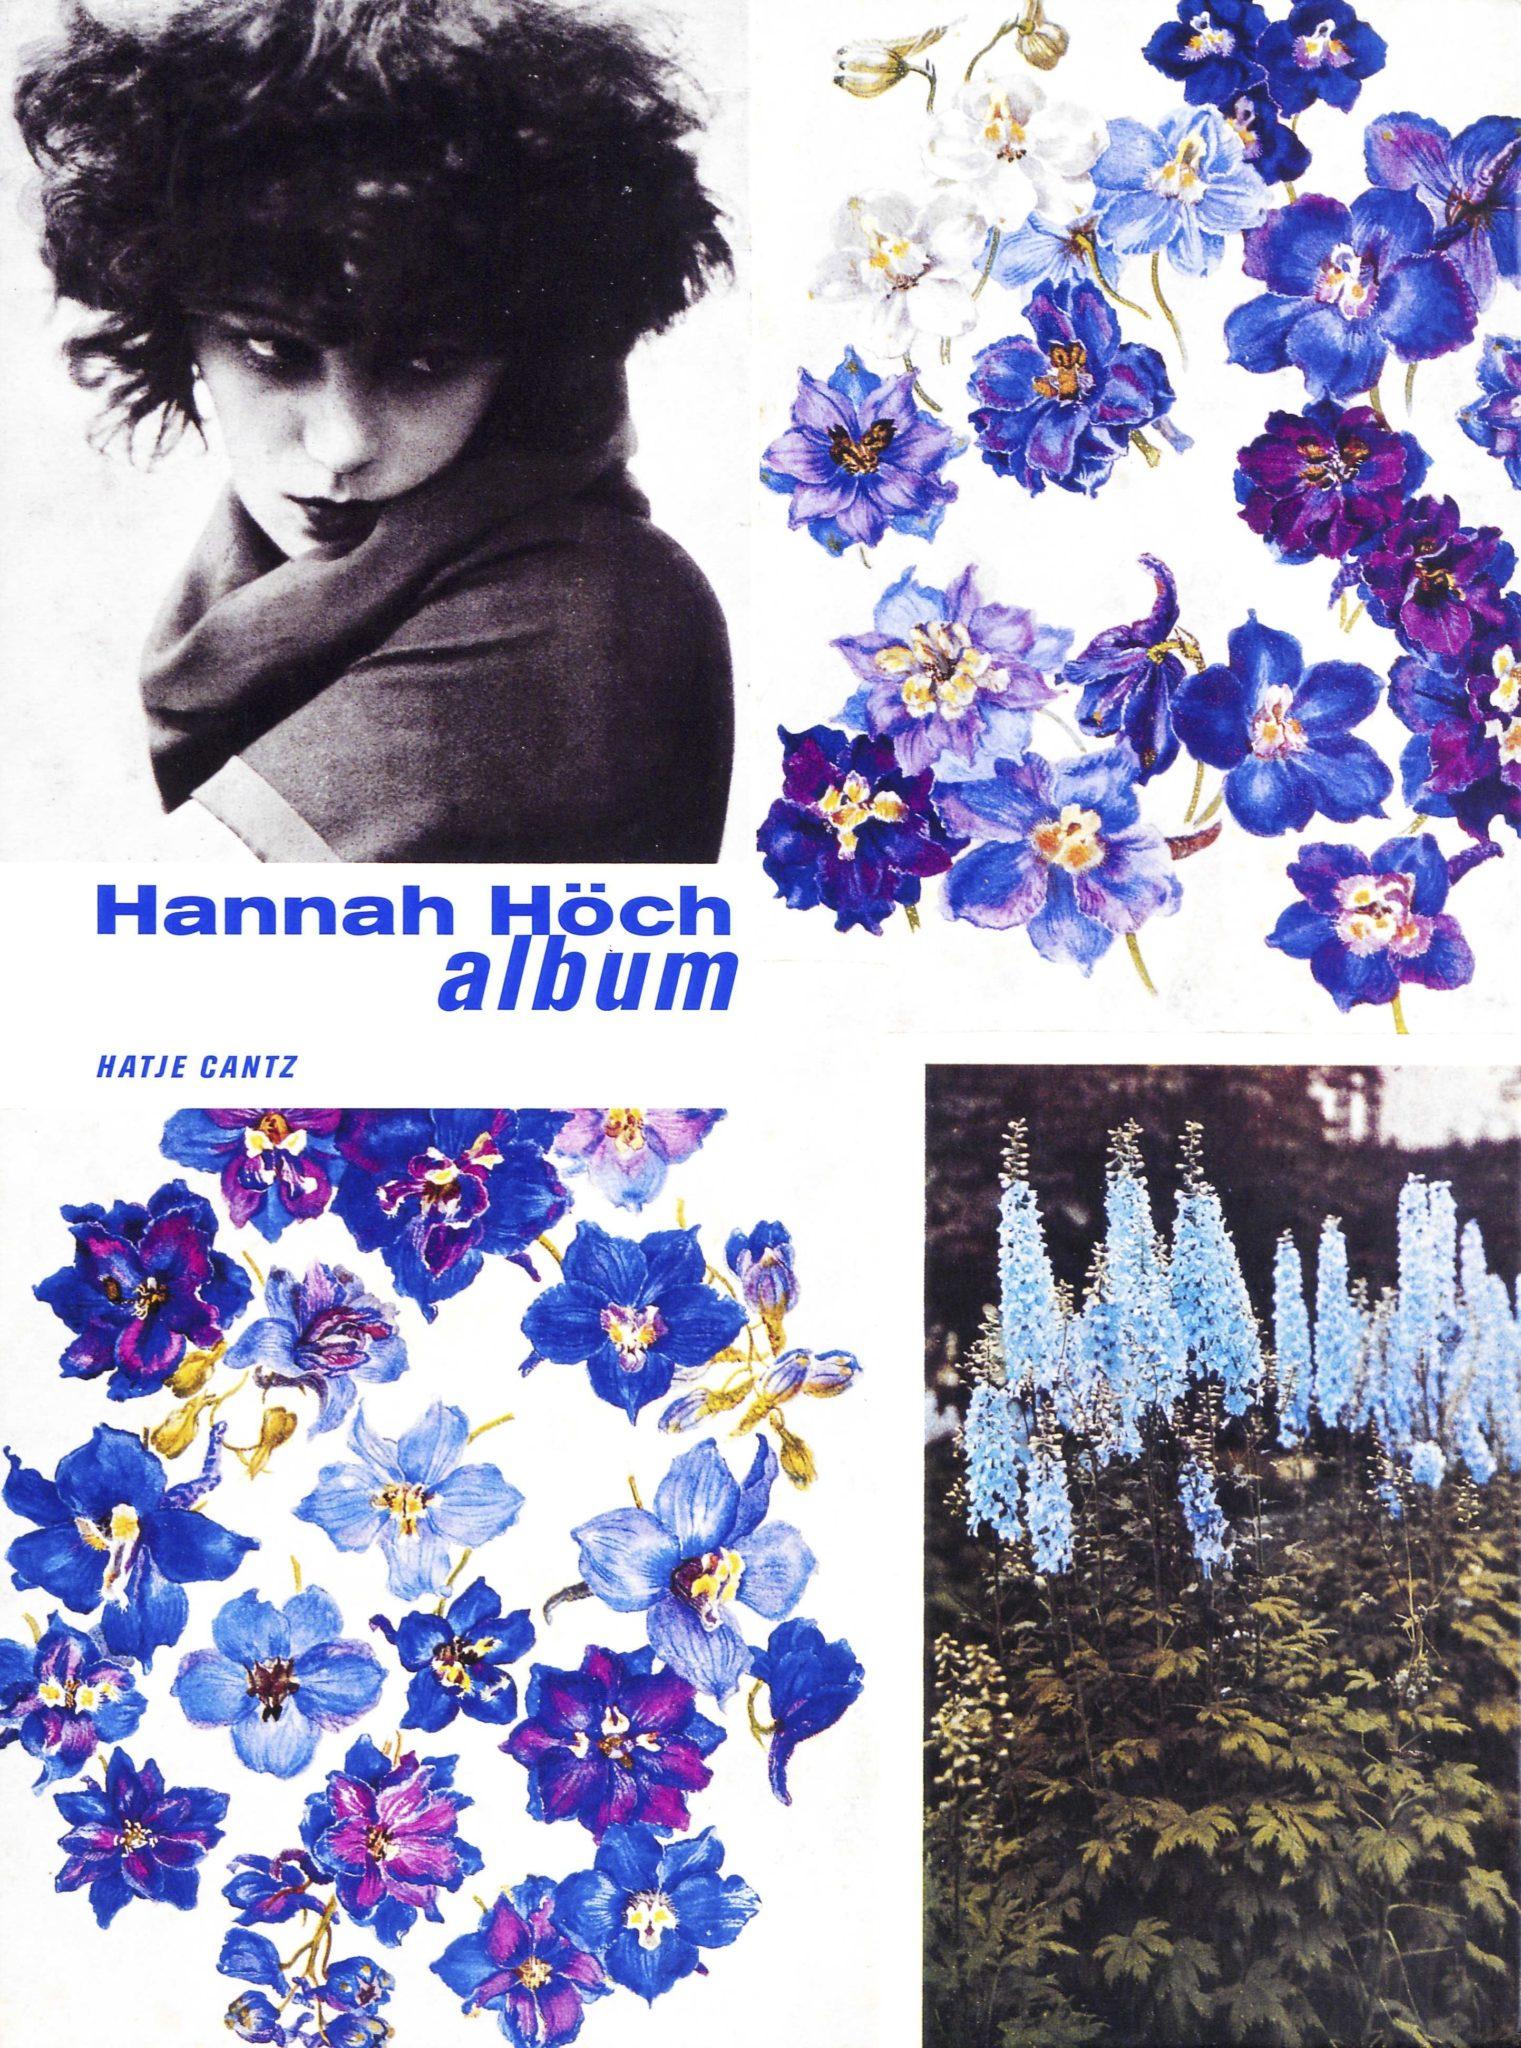 Hannah Höch, <br /><em>Album</em>, 2004 [ca 1933]